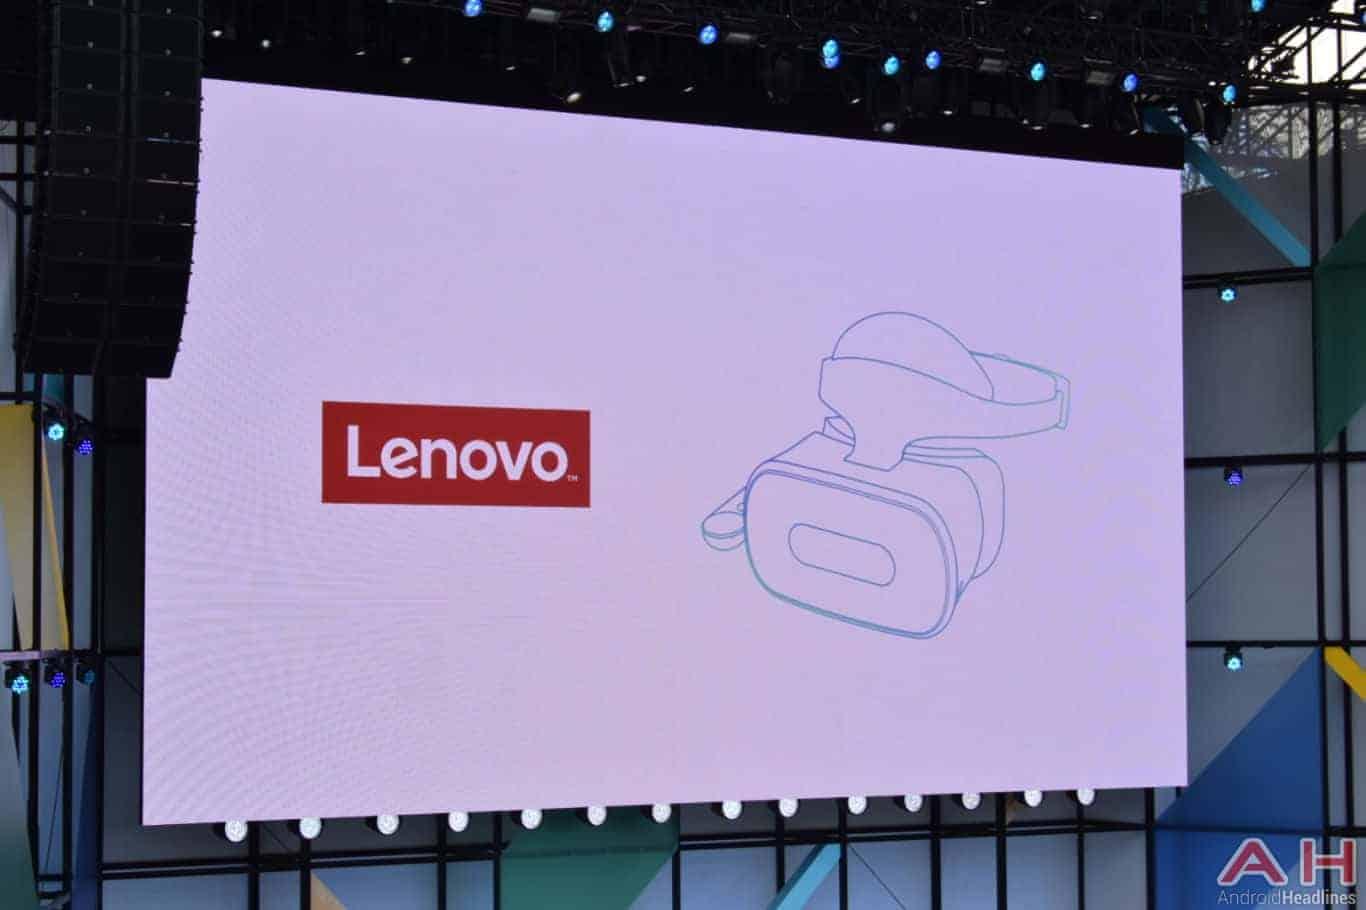 Google IO Keynote 2017 AH 6 26